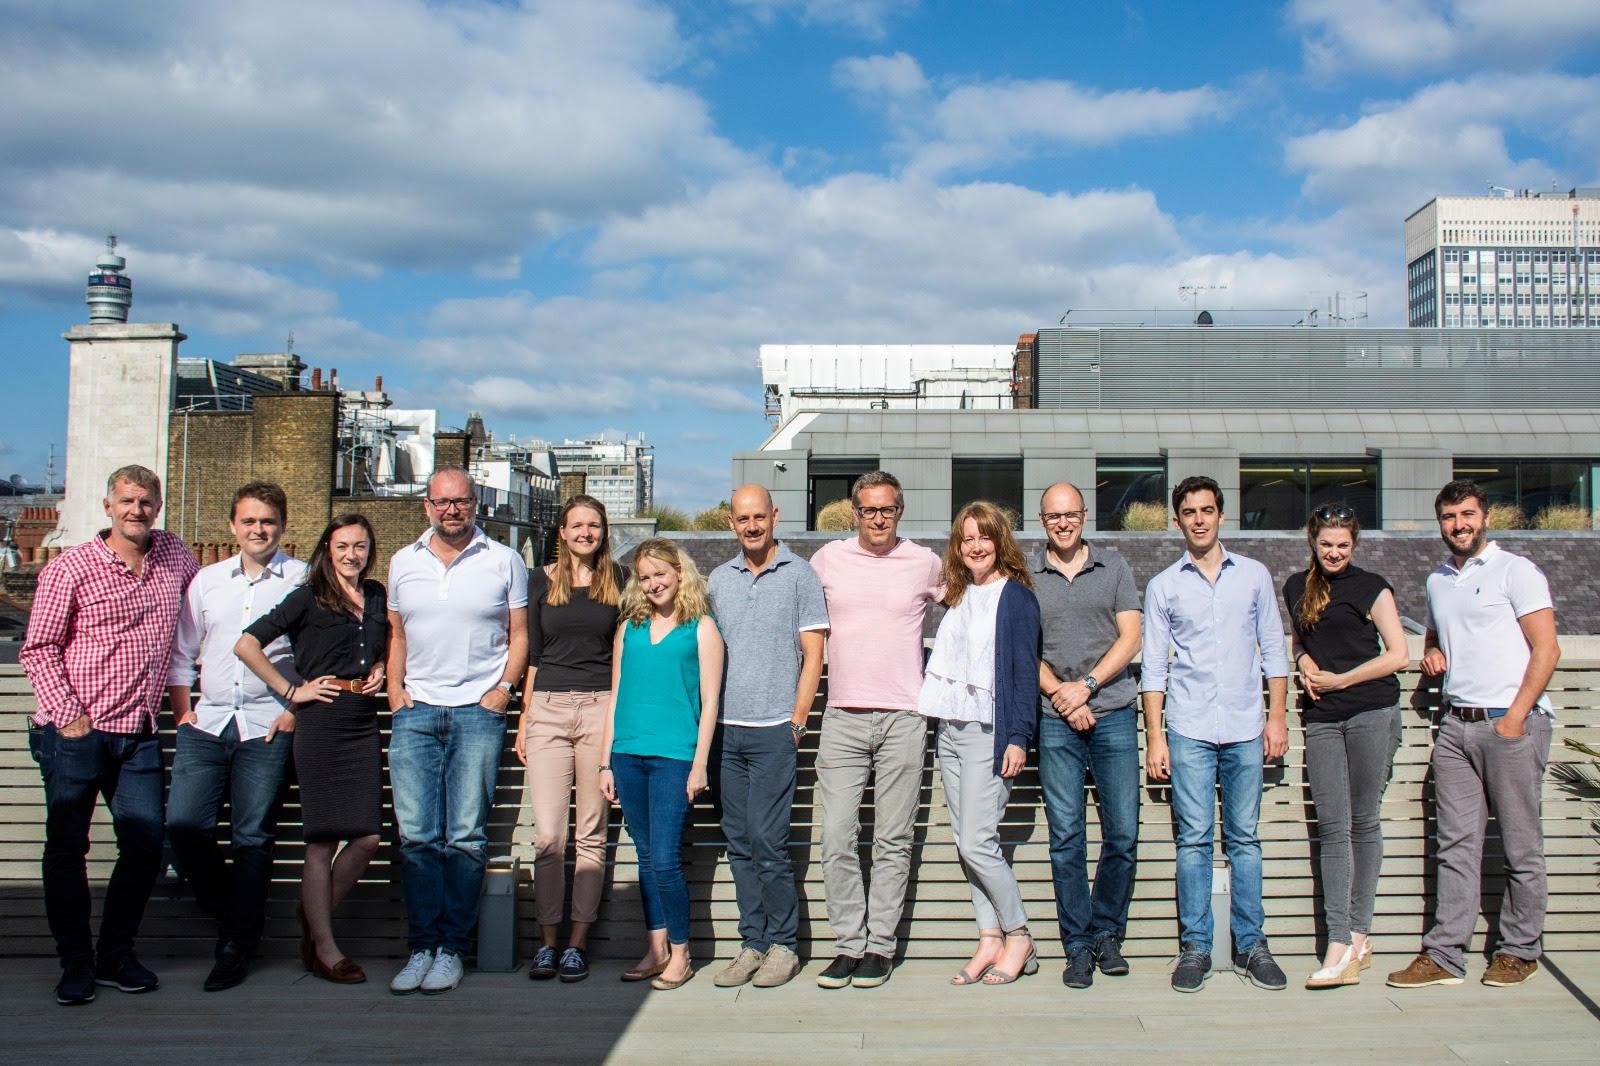 Notion Capital team photo